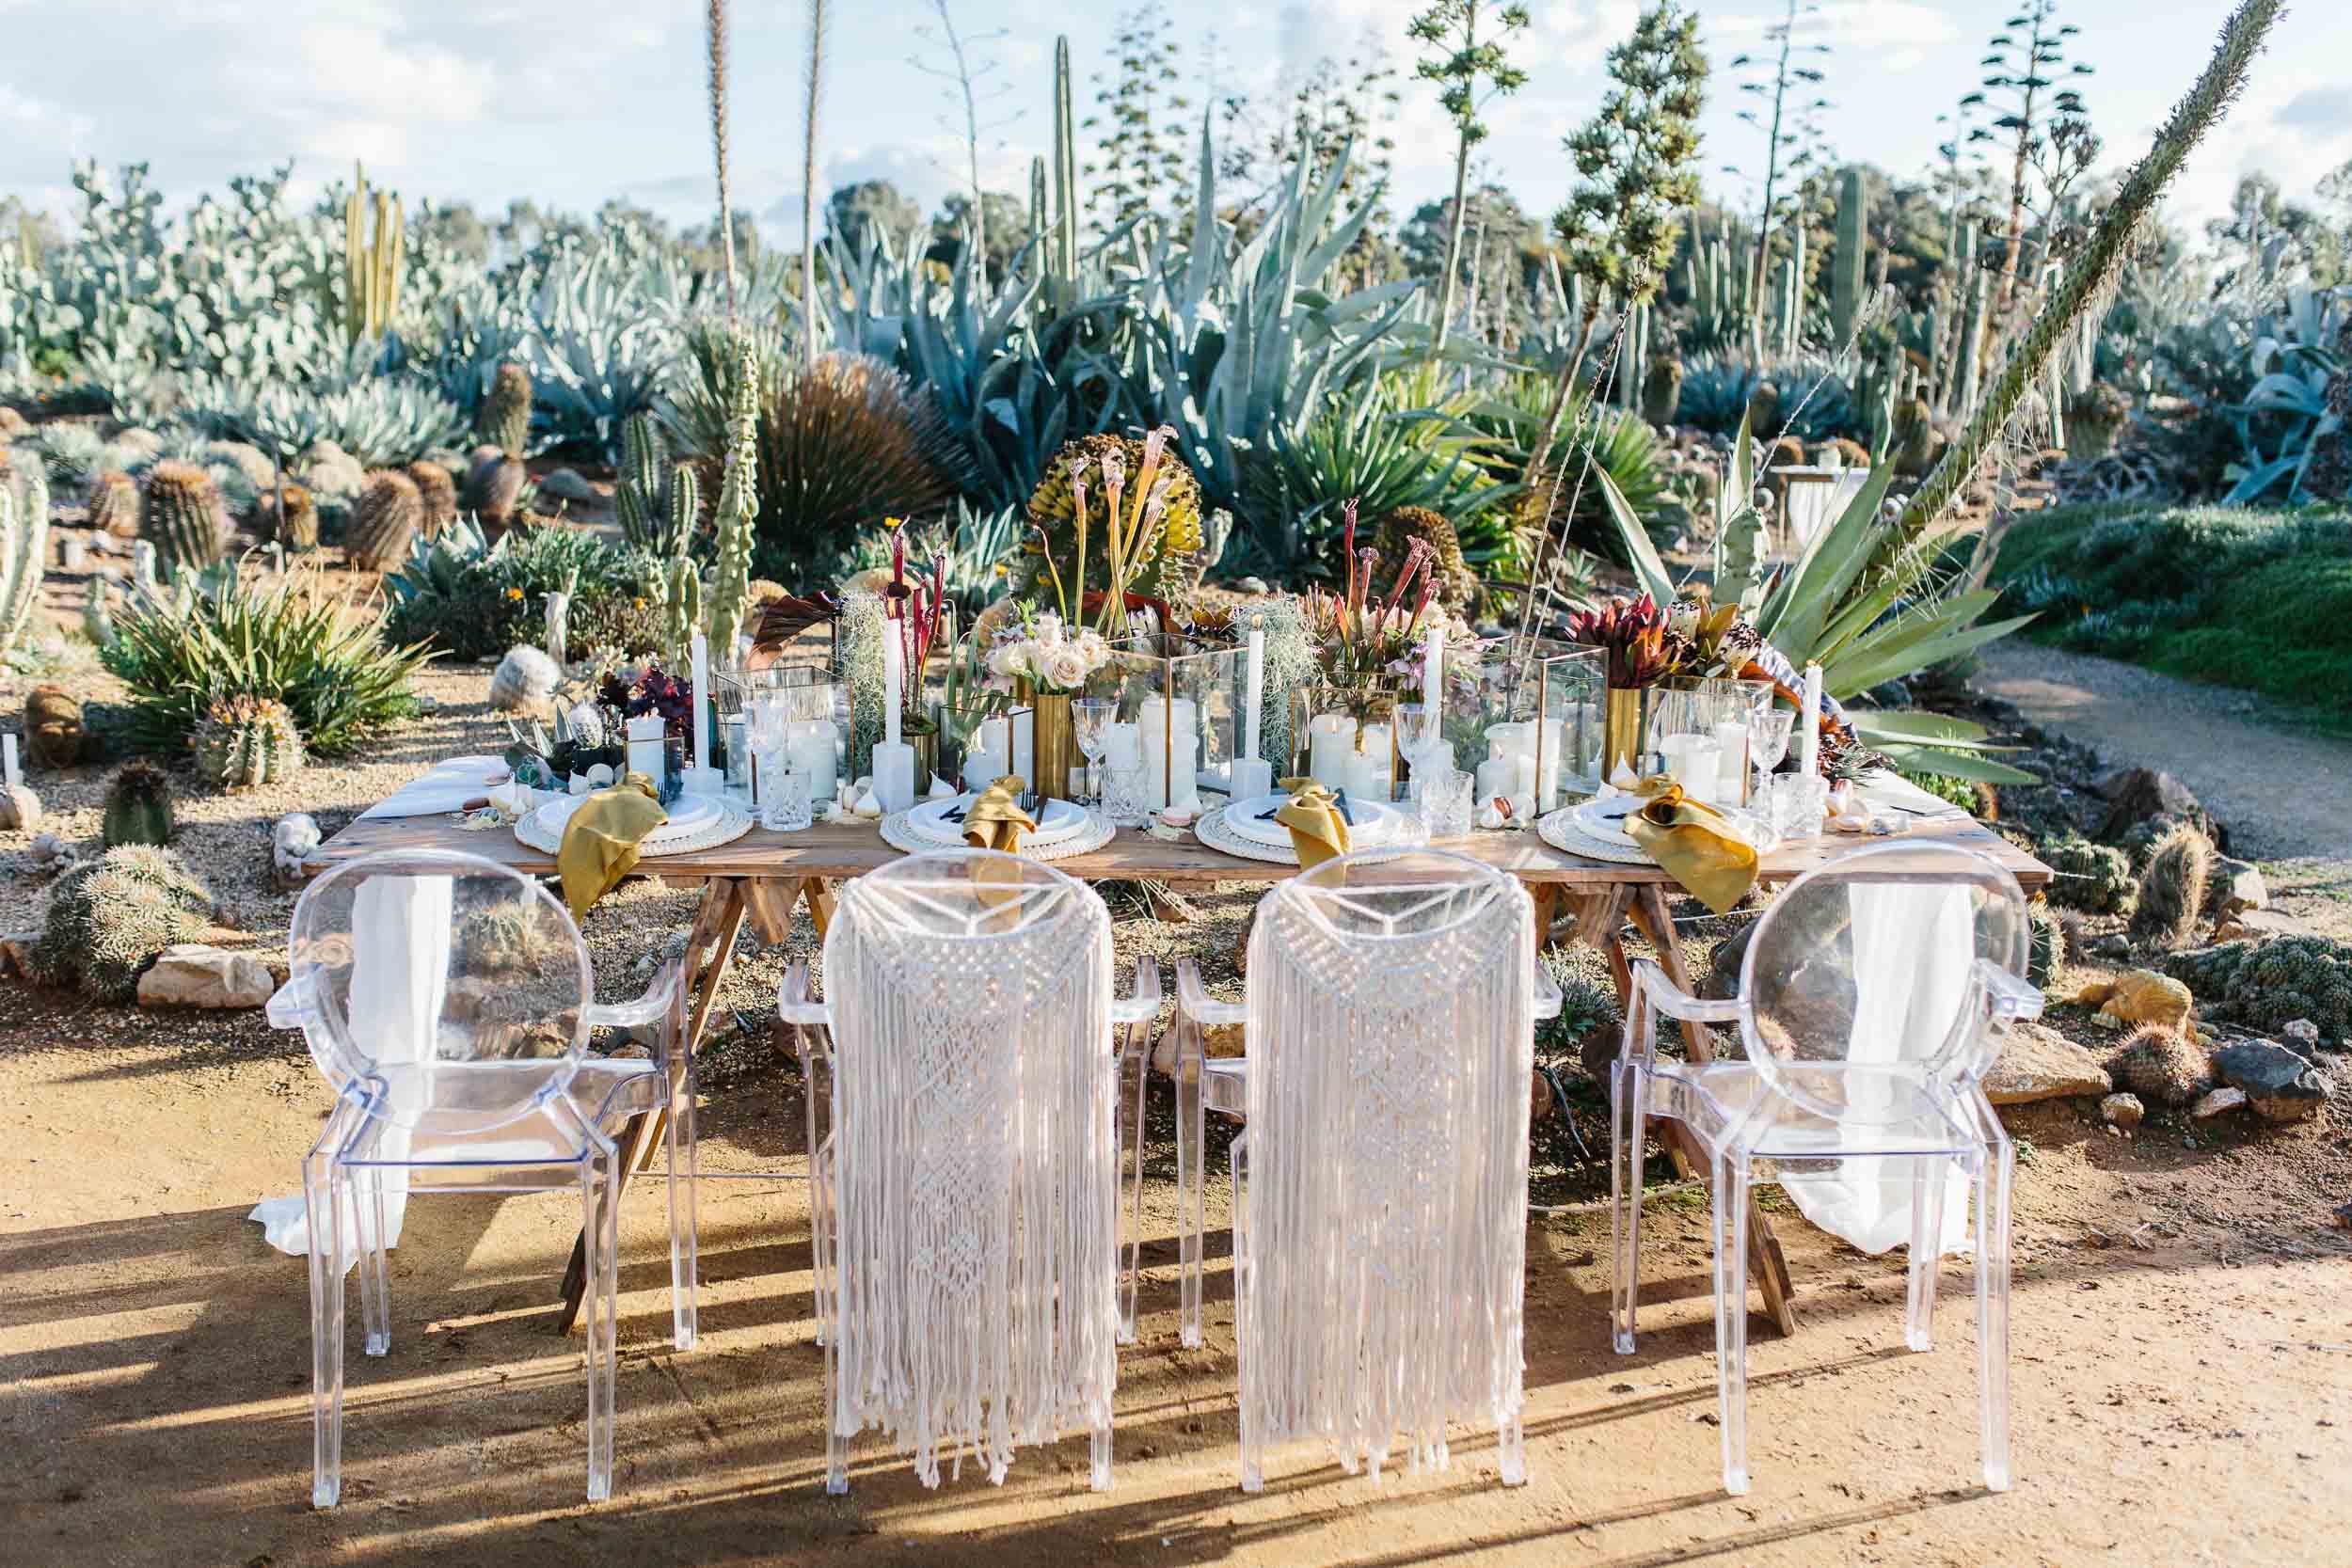 Kas-Richards-Ruby-and-James-Stylist-Cactus-Country-Karen-Willis-Holmes-Bridal-One-Heart-Studios-Boho-Wedding-1.jpg